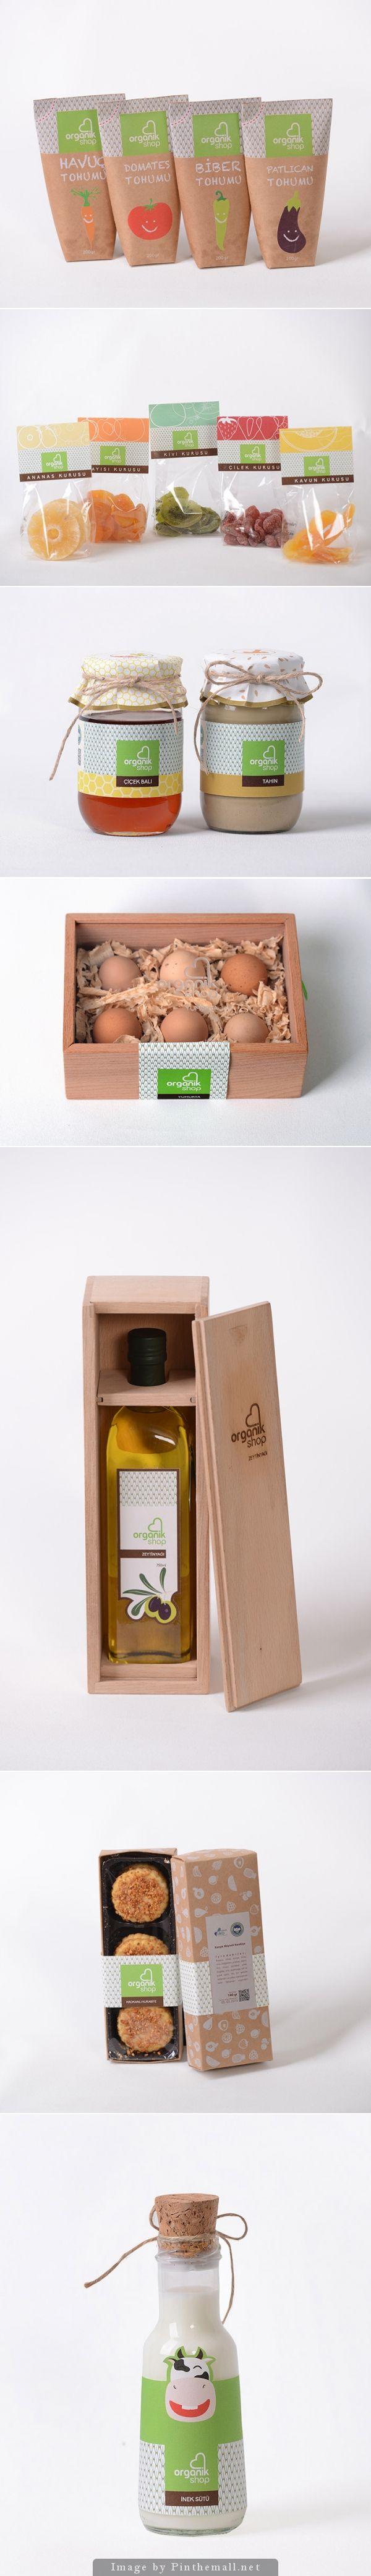 organic shop - food packaging PD